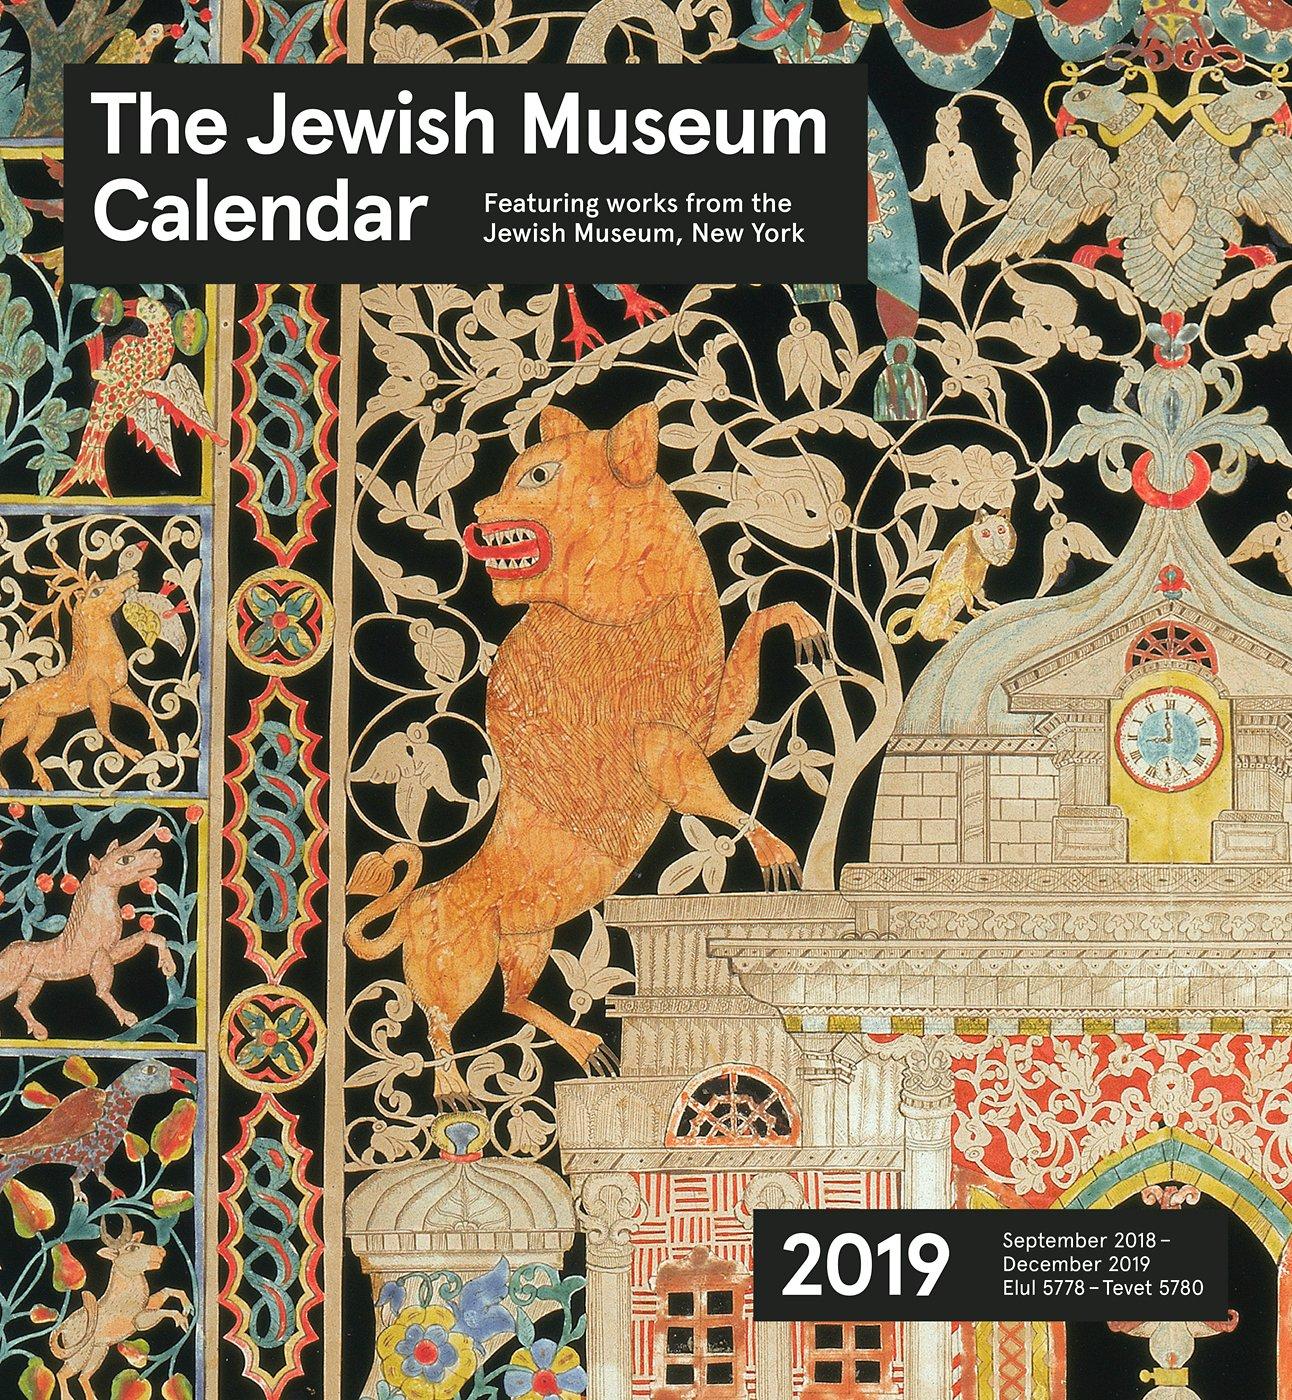 December 2019 Nyc Art Calendar The Jewish Museum Calendar 2019: Pomegranate Communications Inc